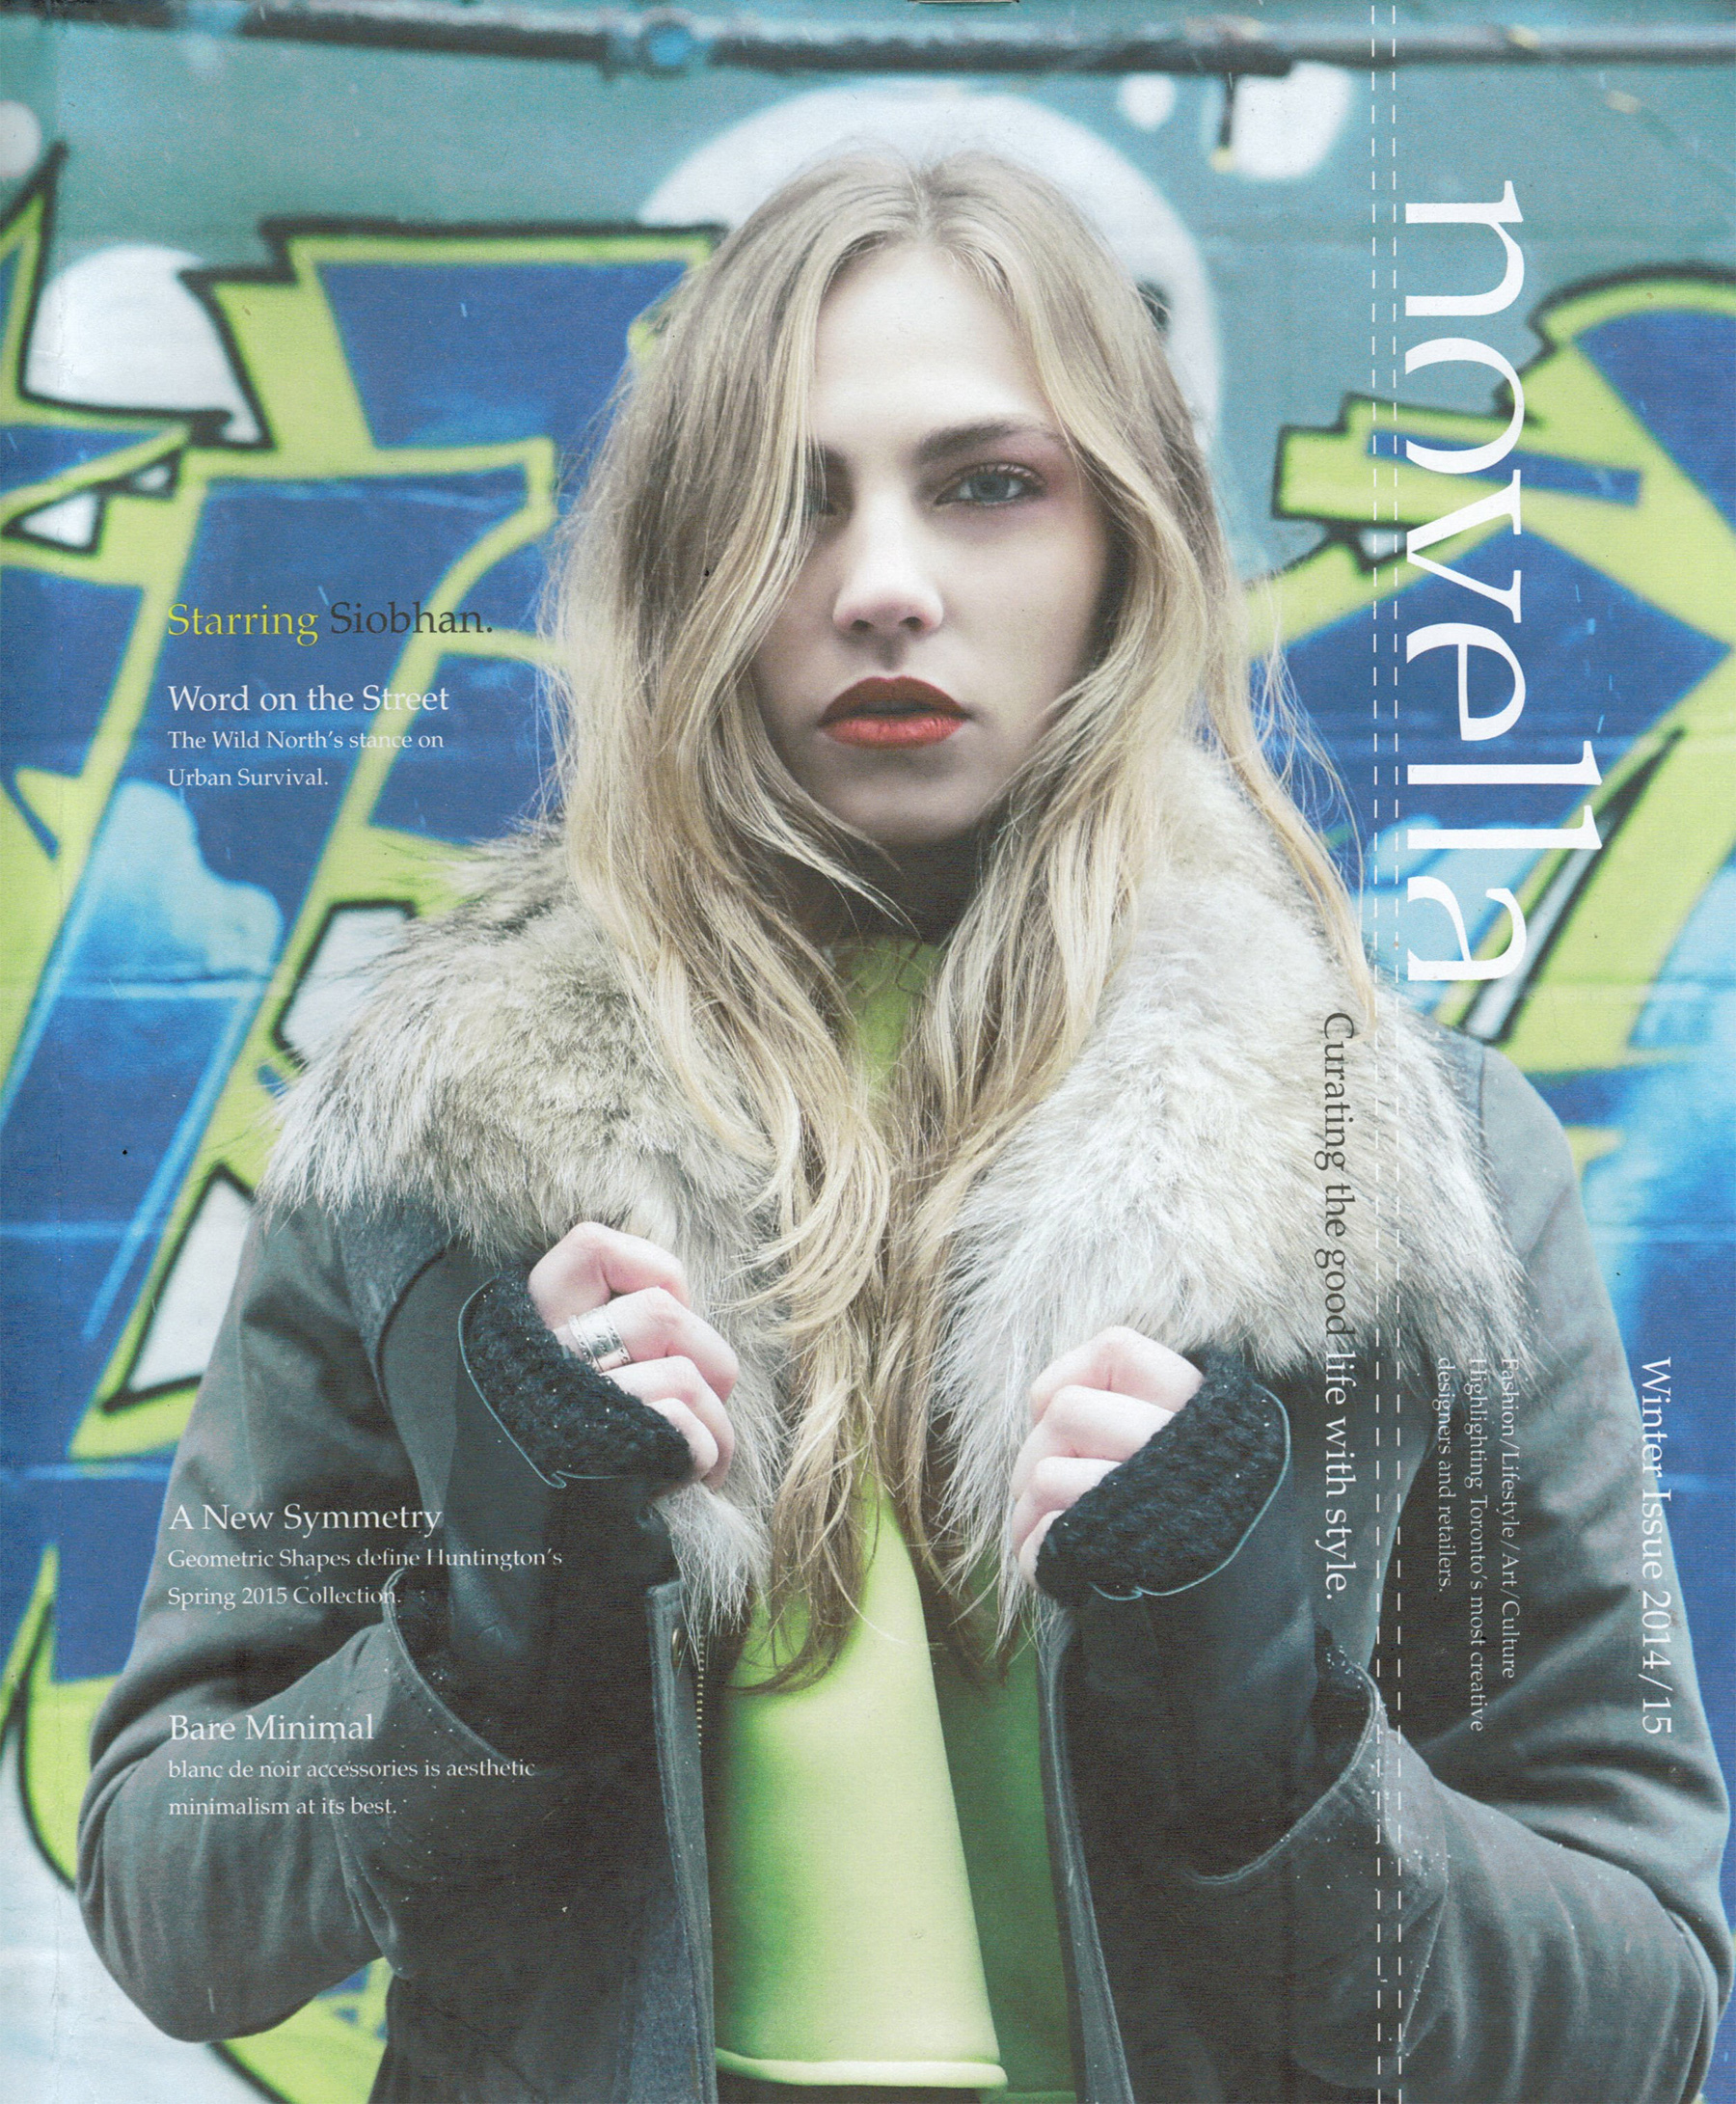 Lacc_Novella_Winter14-15_cover.jpg